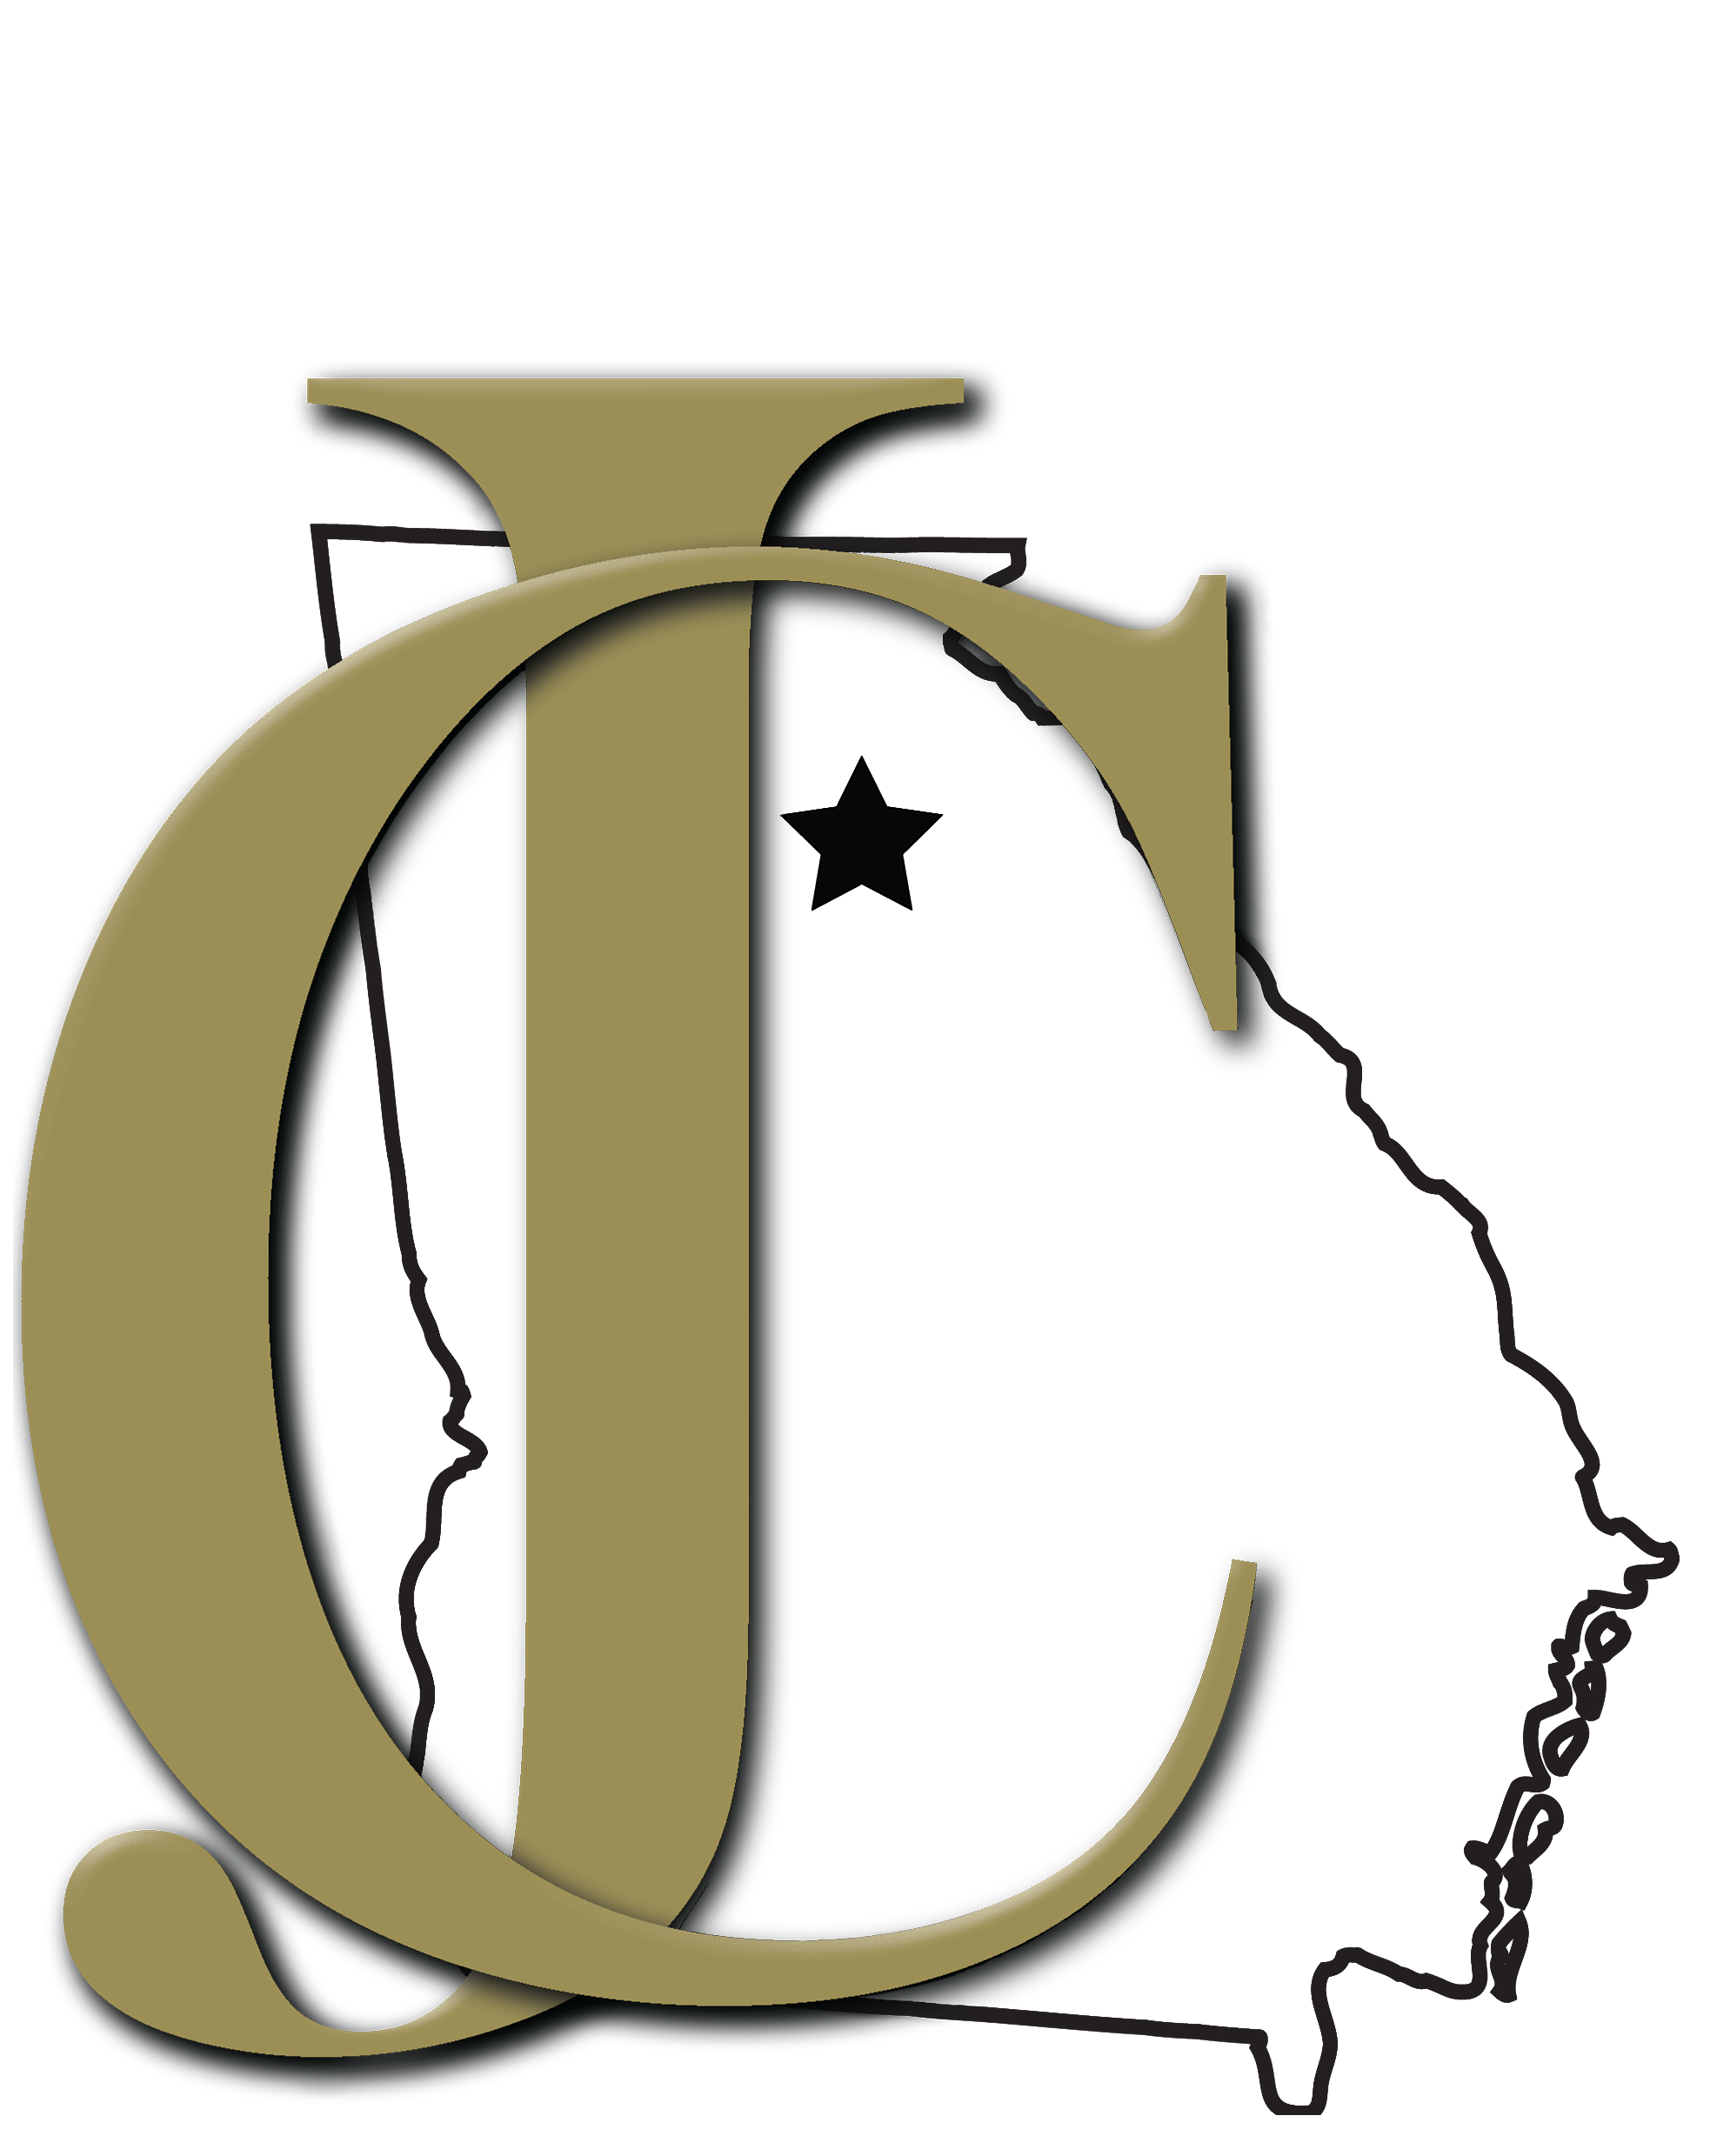 Jackson County Schools (Georgia)